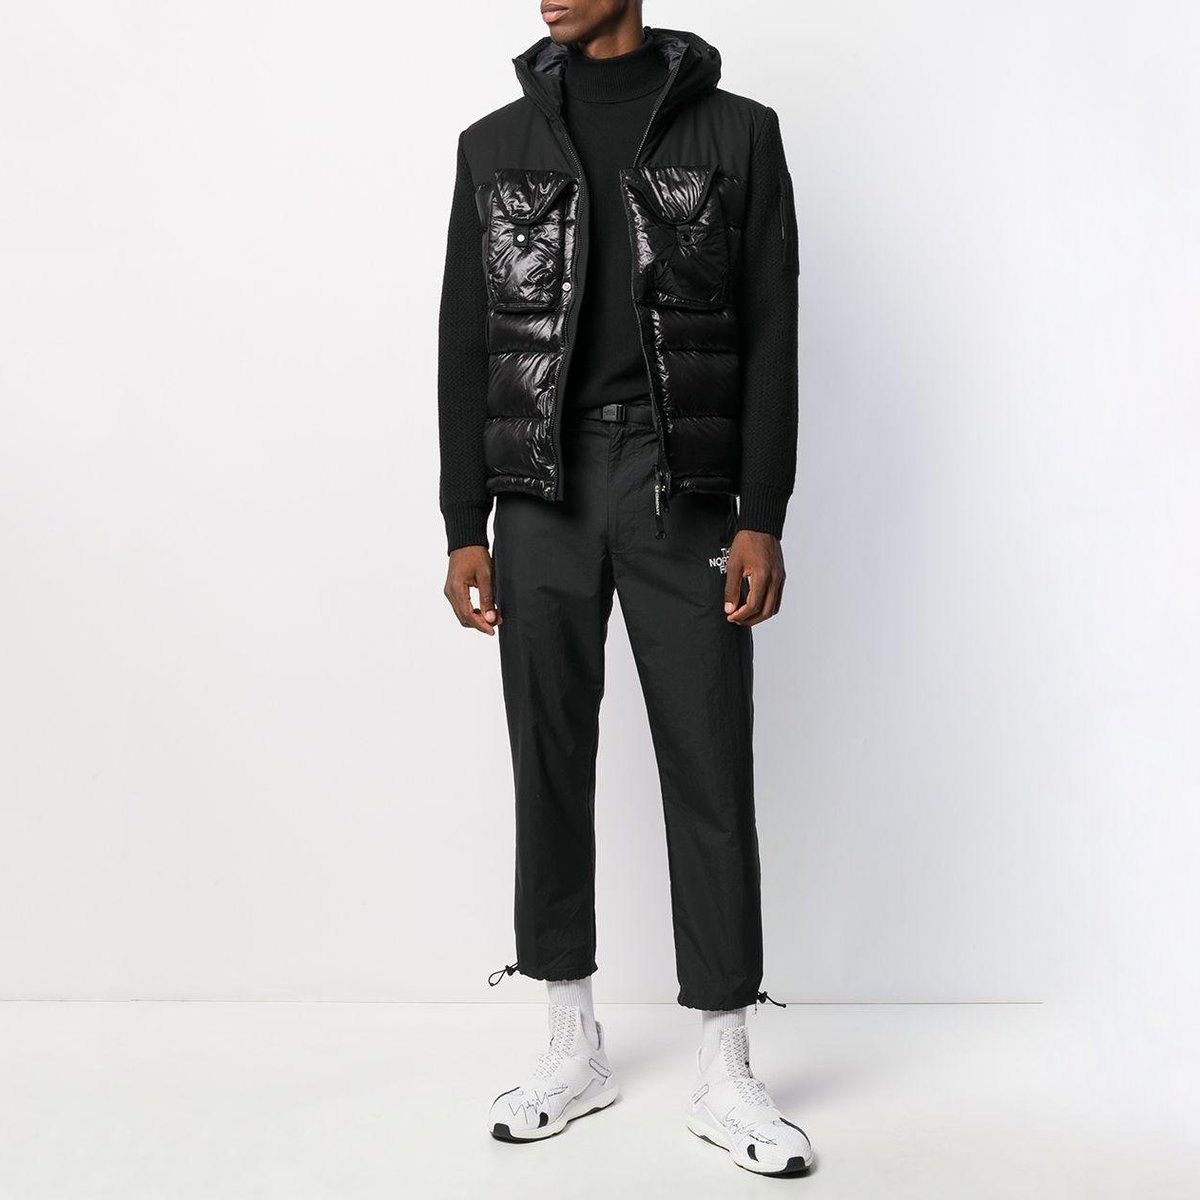 c-p-company-Black-Zipped-Padded-Jacket (3).jpg